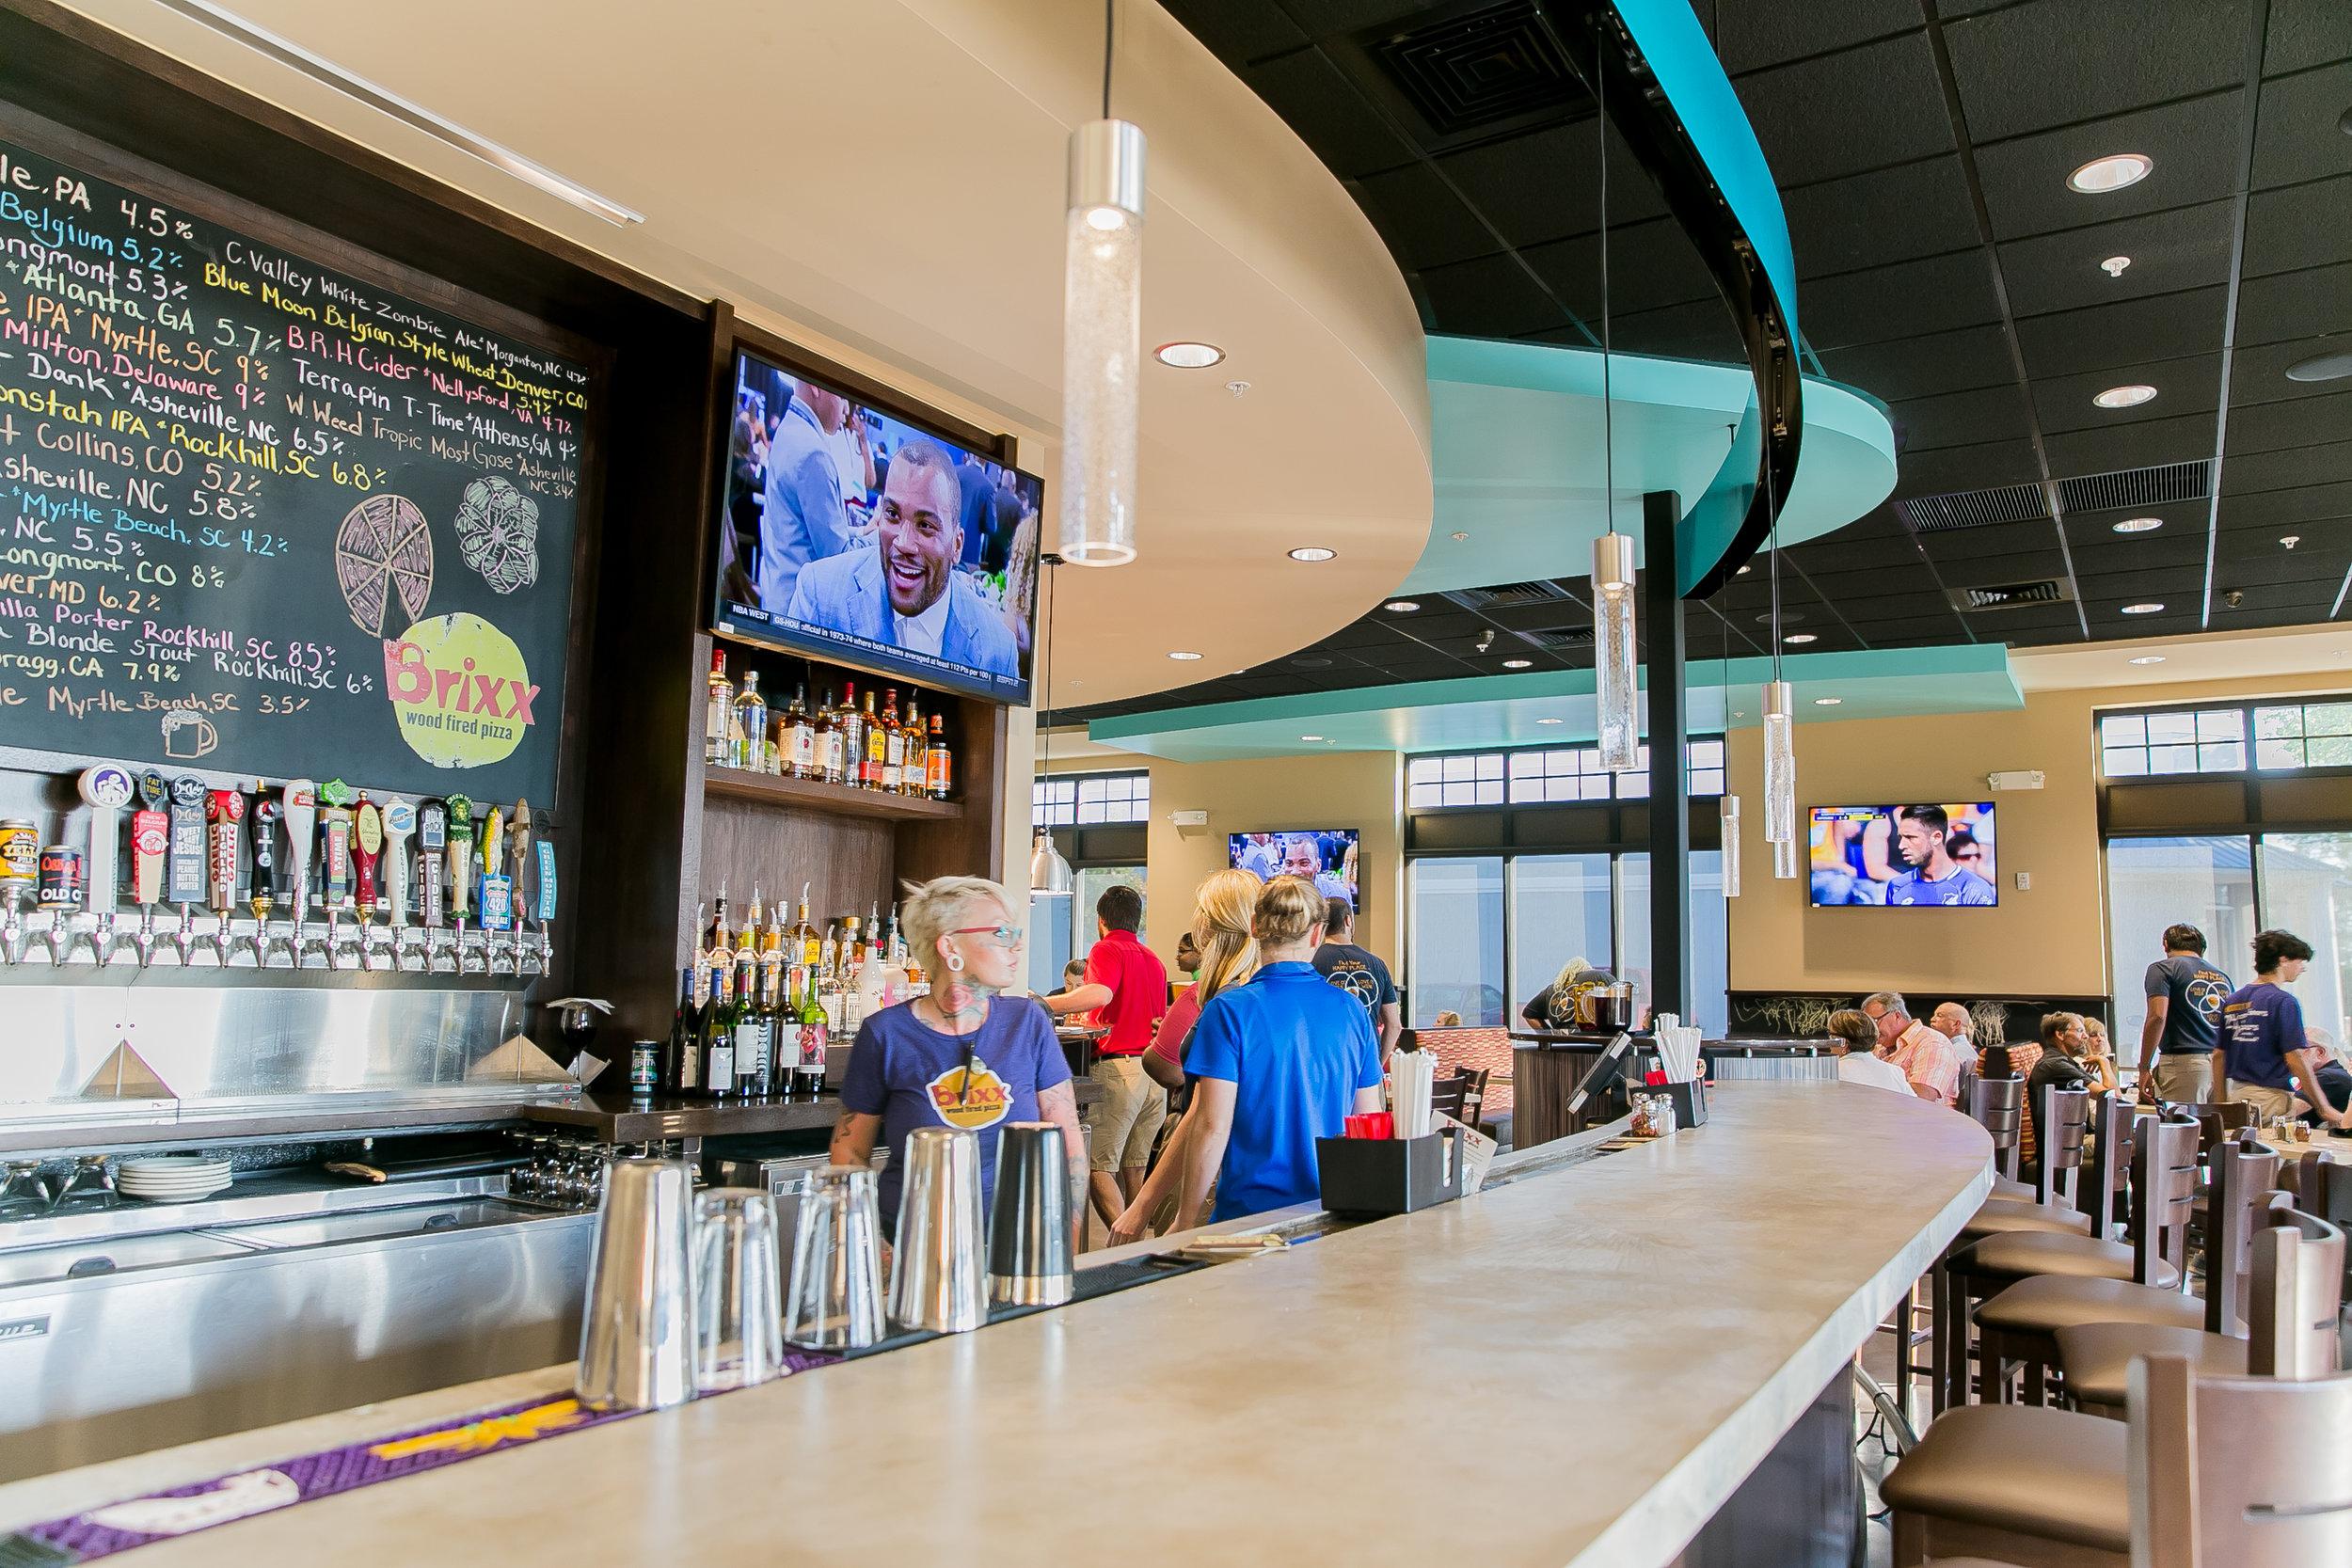 ADW-Restaurant-Brixx-Myrtle-Beach-NC-Bar.jpg